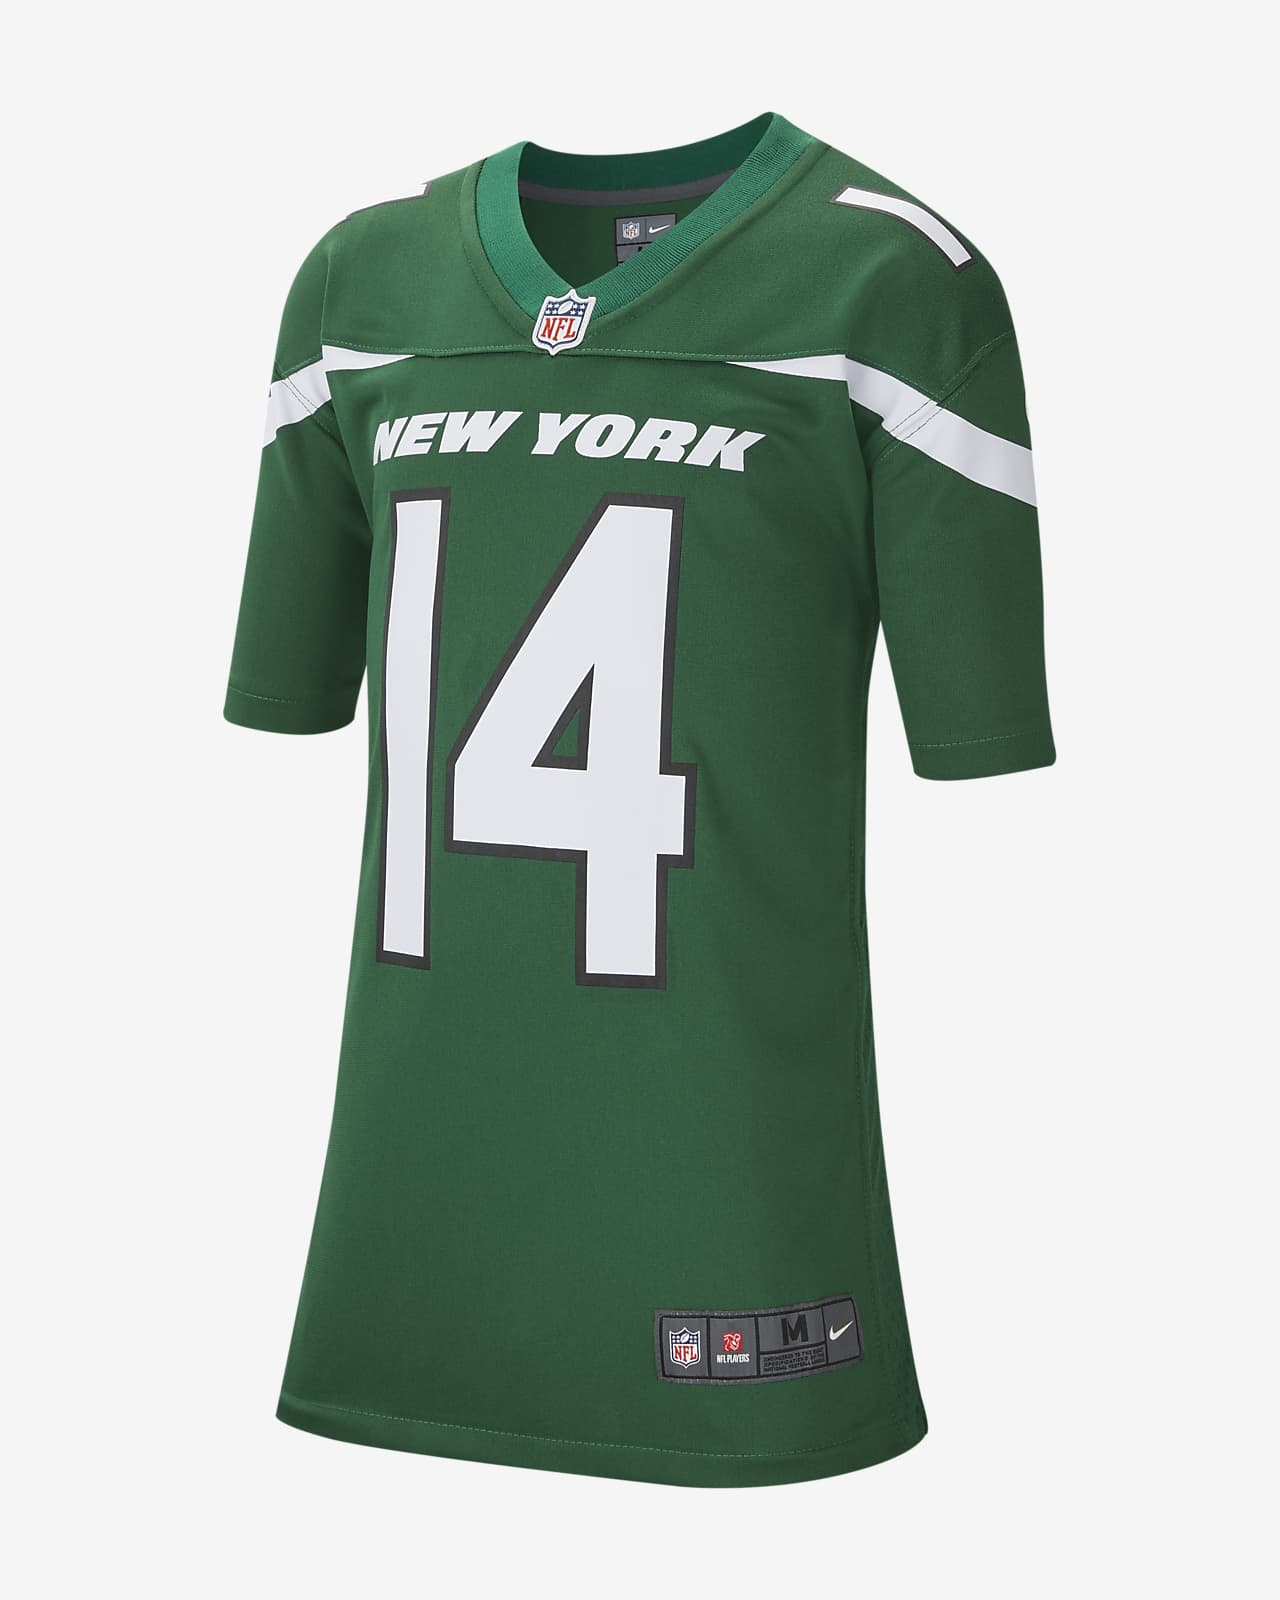 NFL New York Jets (Sam Darnold) Big Kids' Game Football Jersey